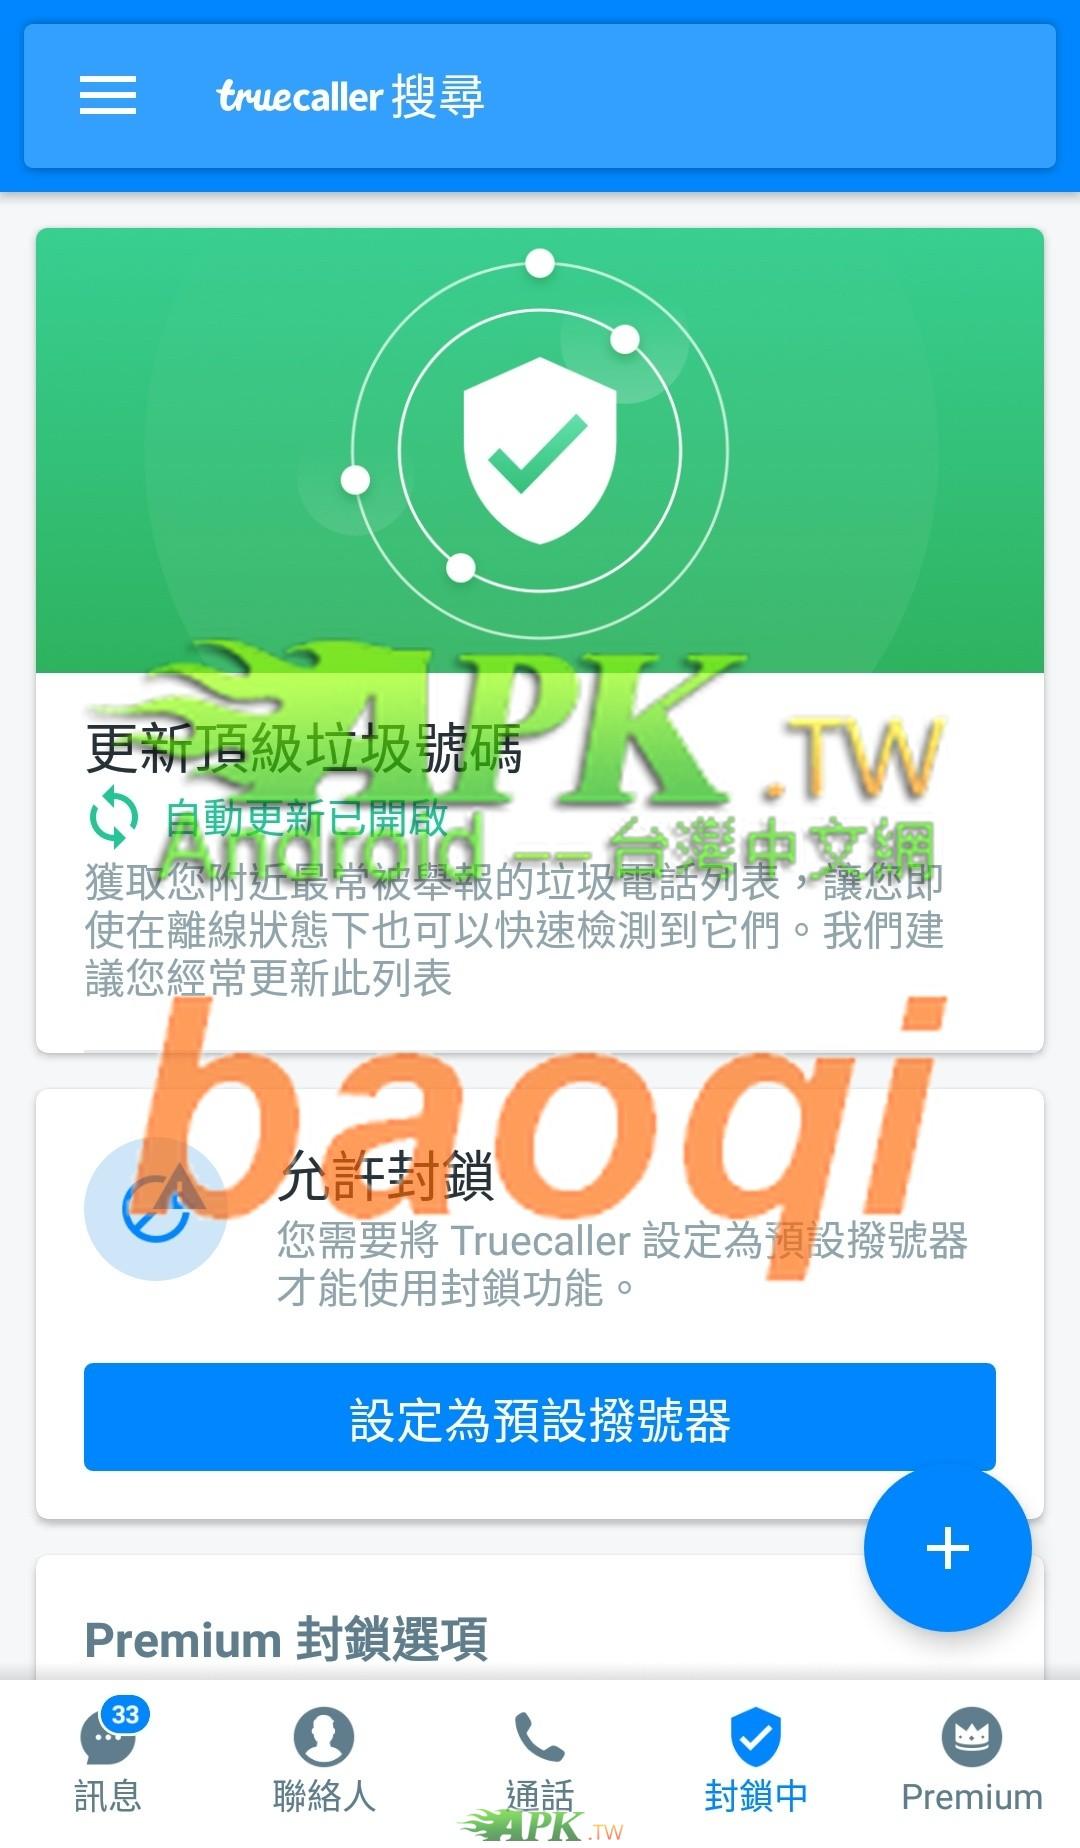 Truecaller_Premium_2_.jpg